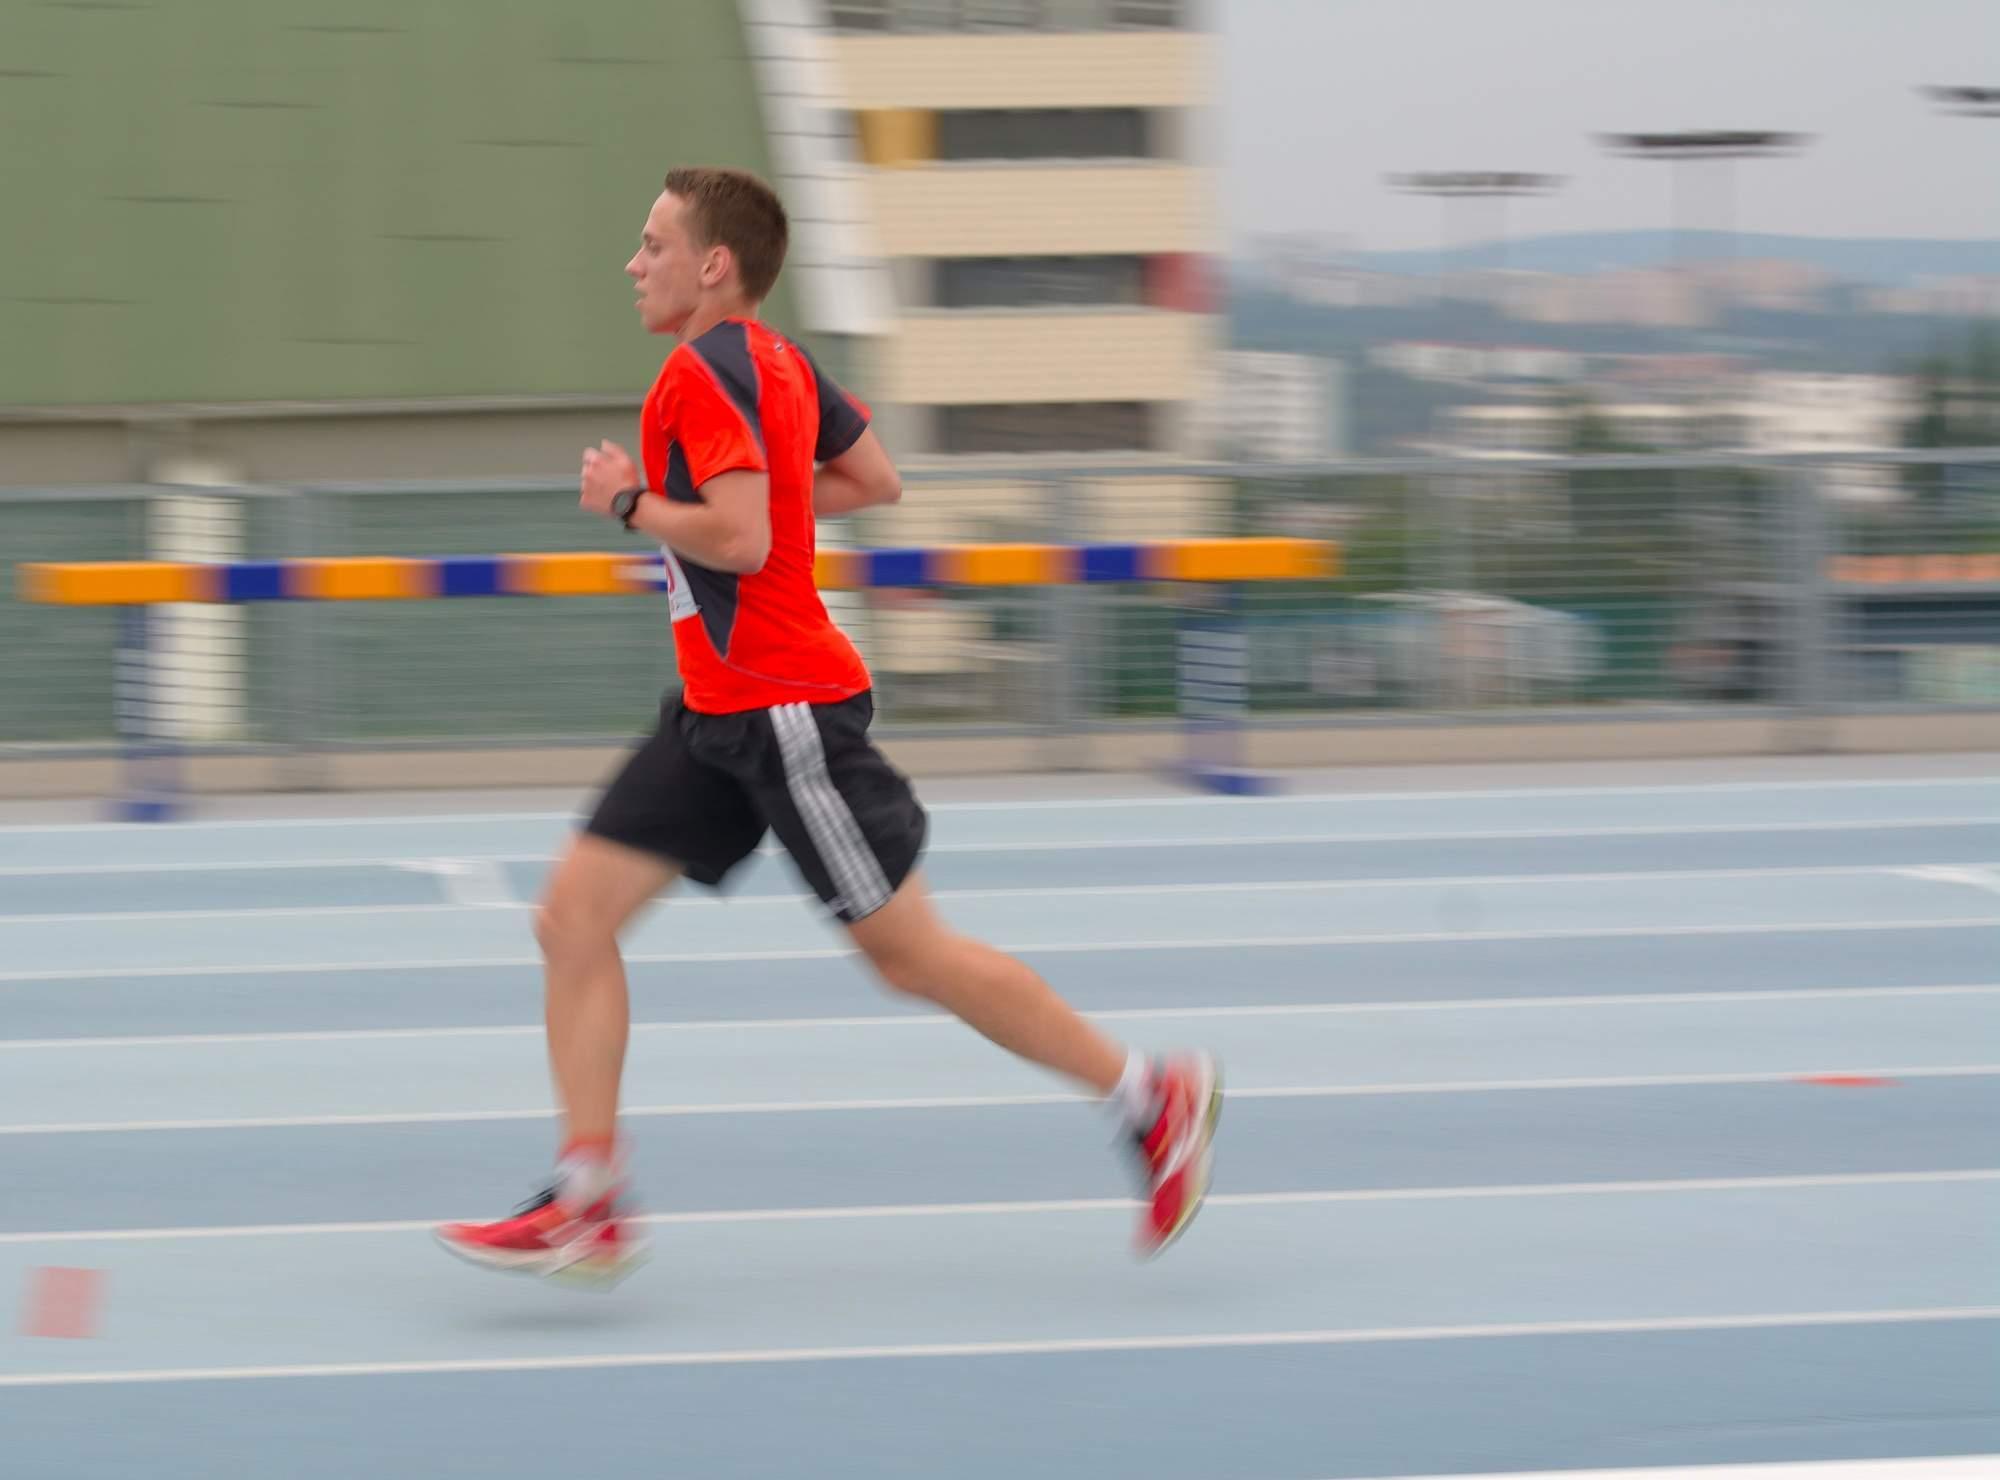 5K track